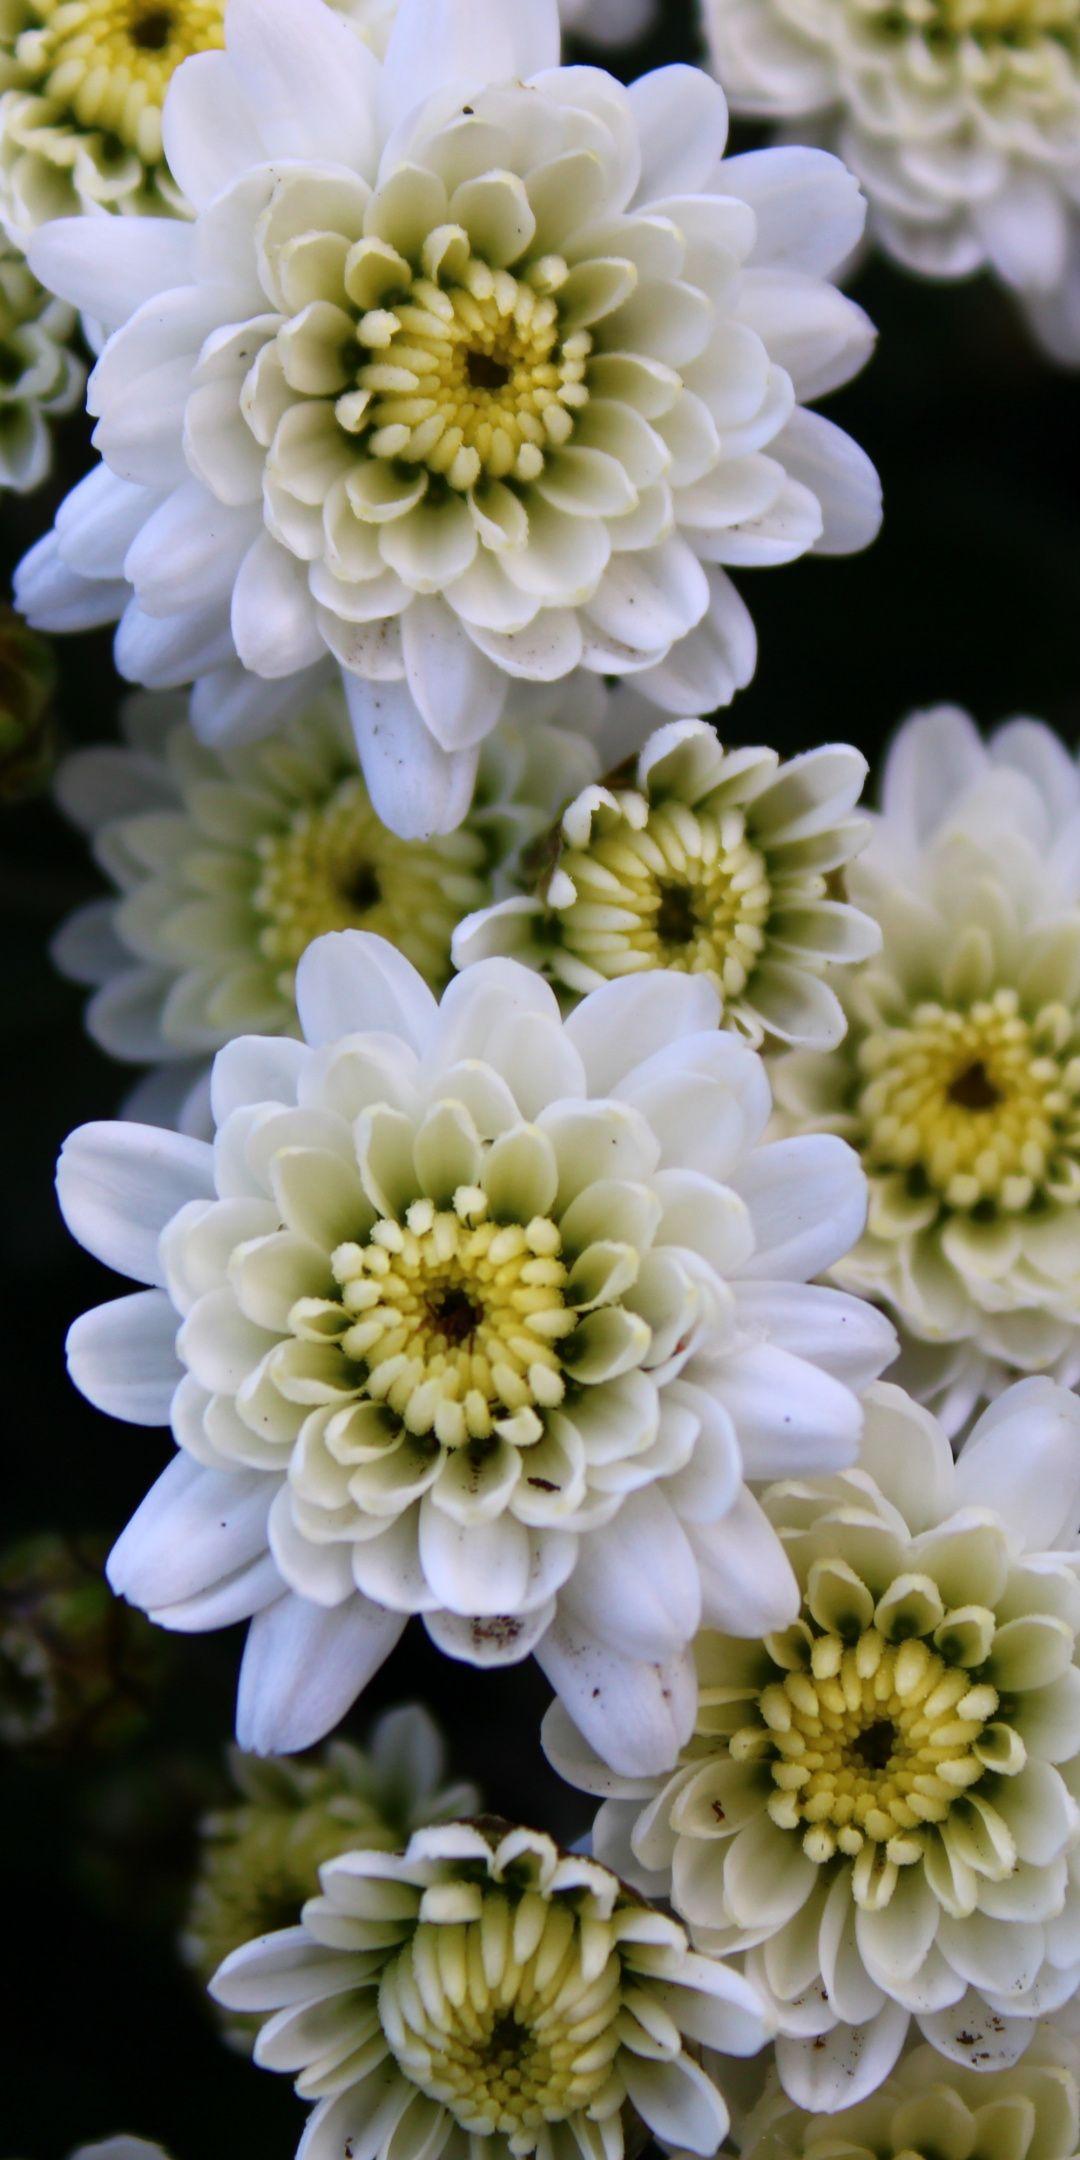 White Chrysanthemum flowers x wallpaper Wallpapers